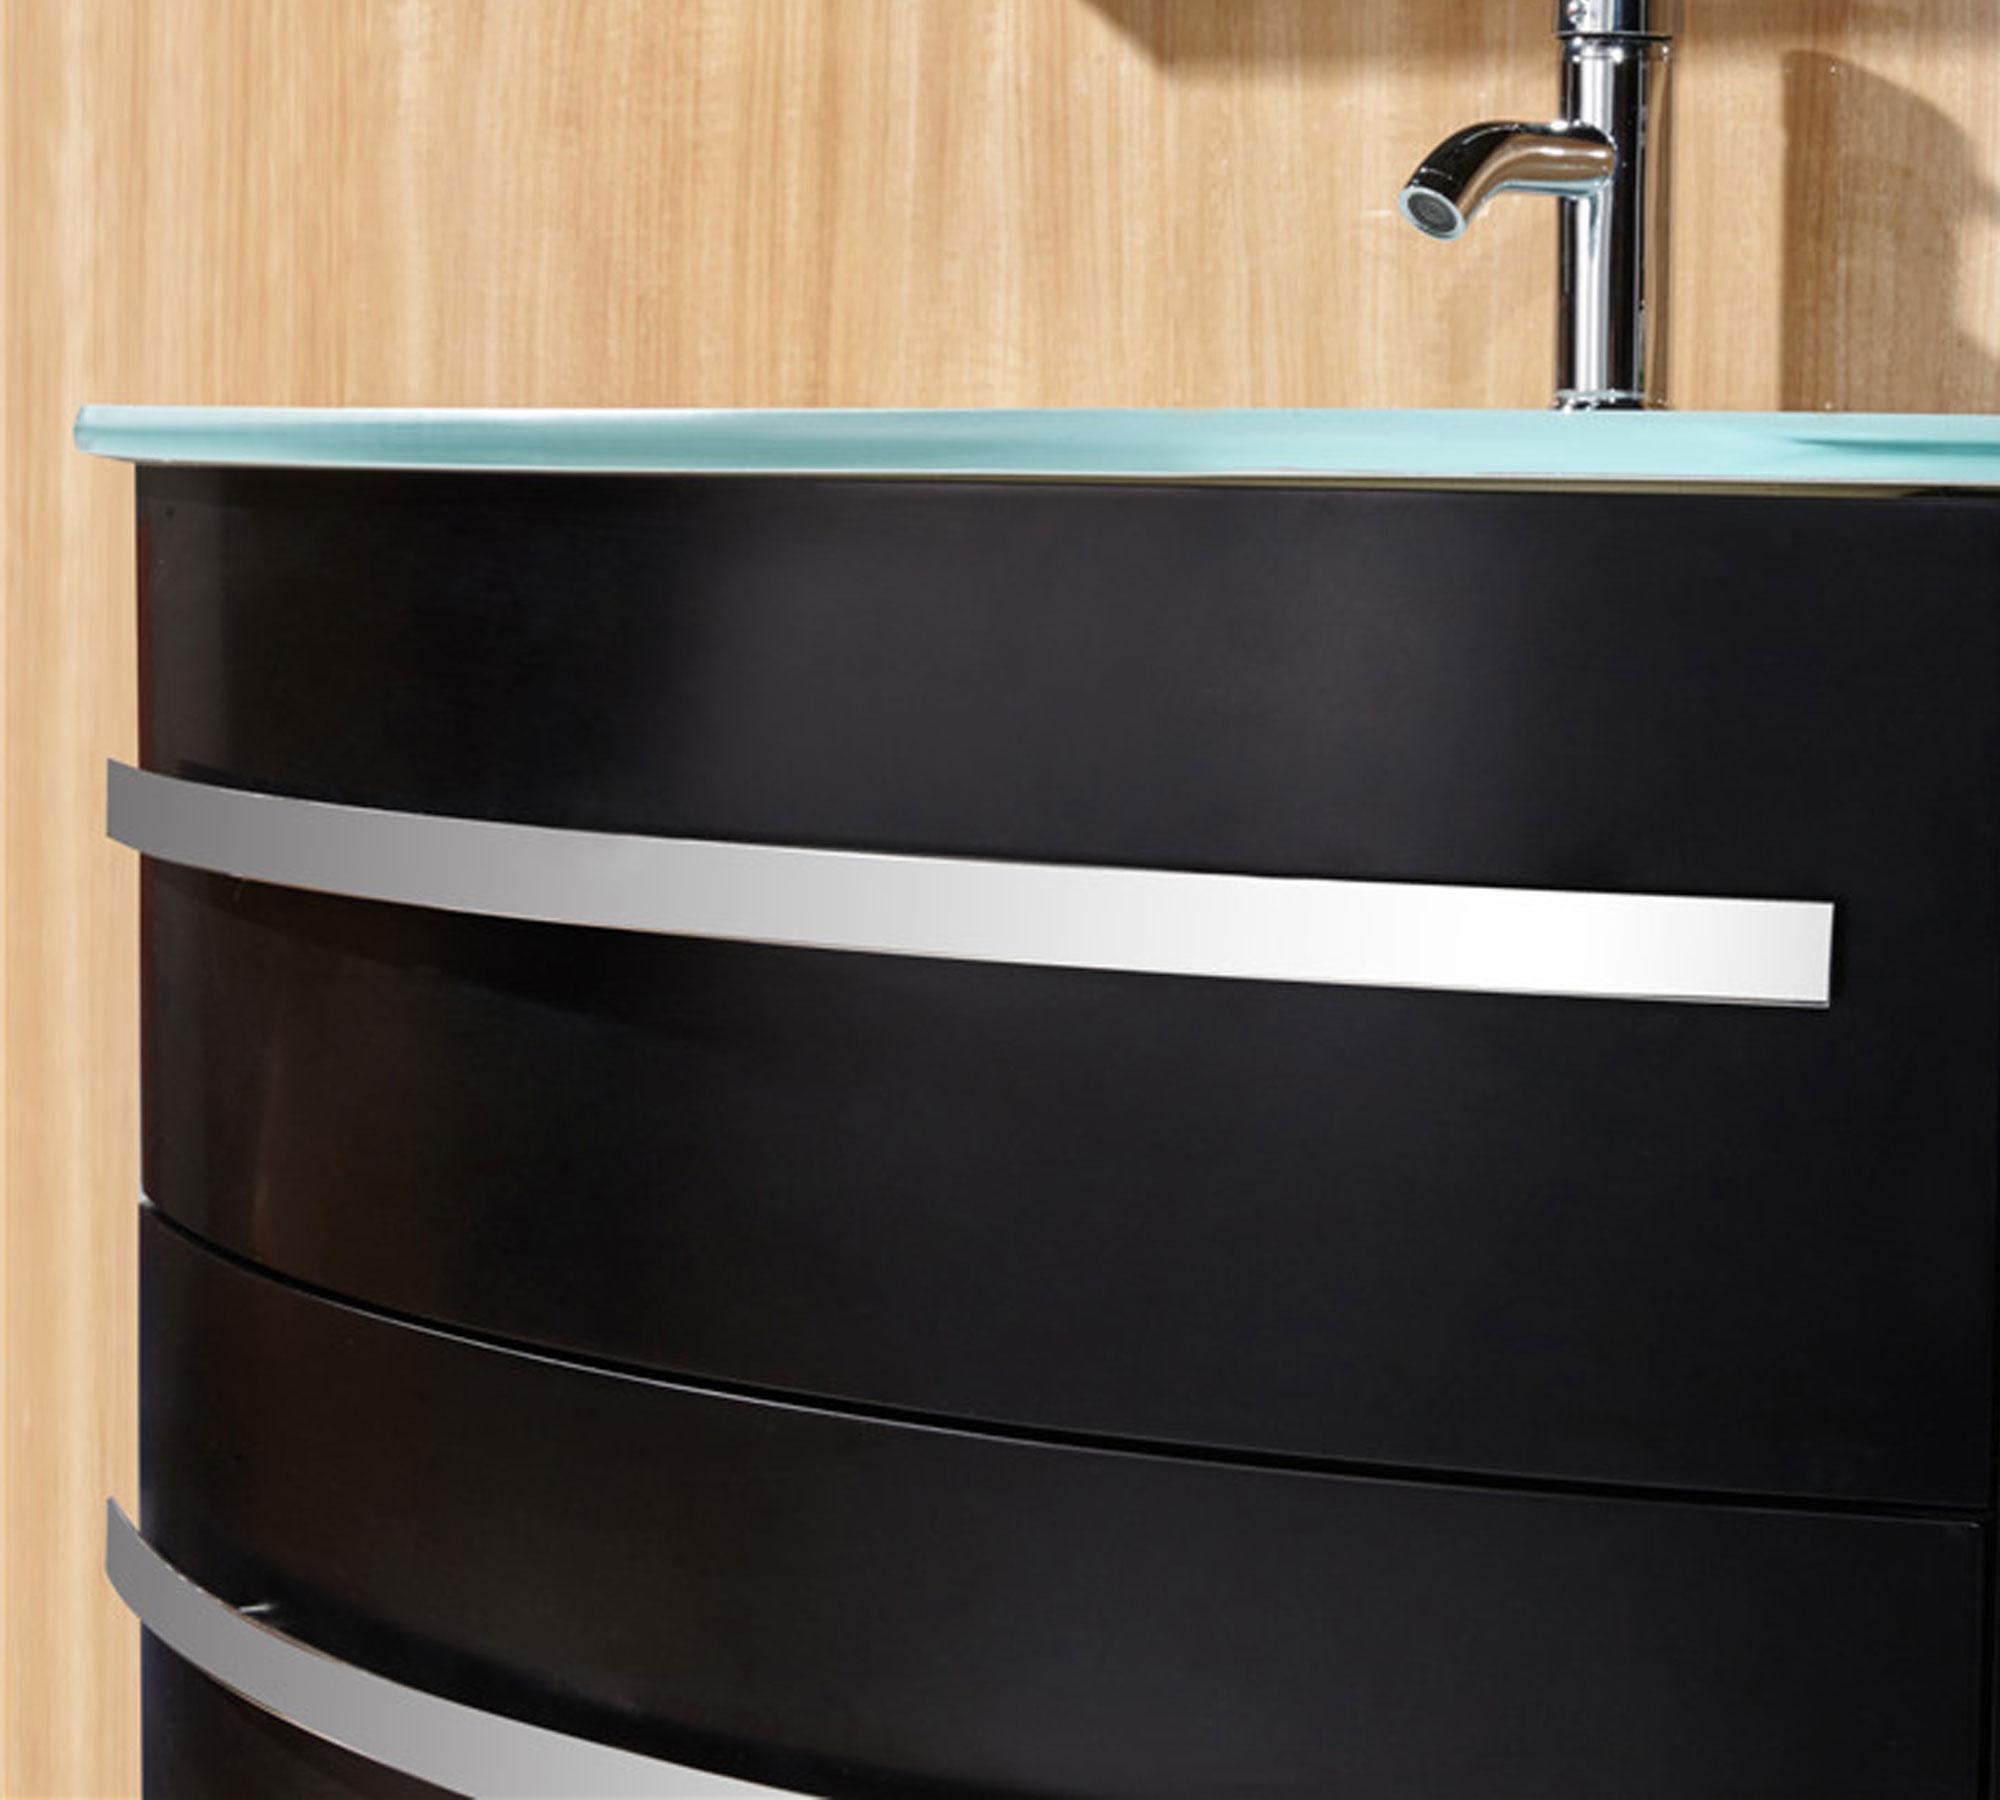 Black ambassador mobile bagno arredo bagno 120 cm - Arredo bagno black friday ...